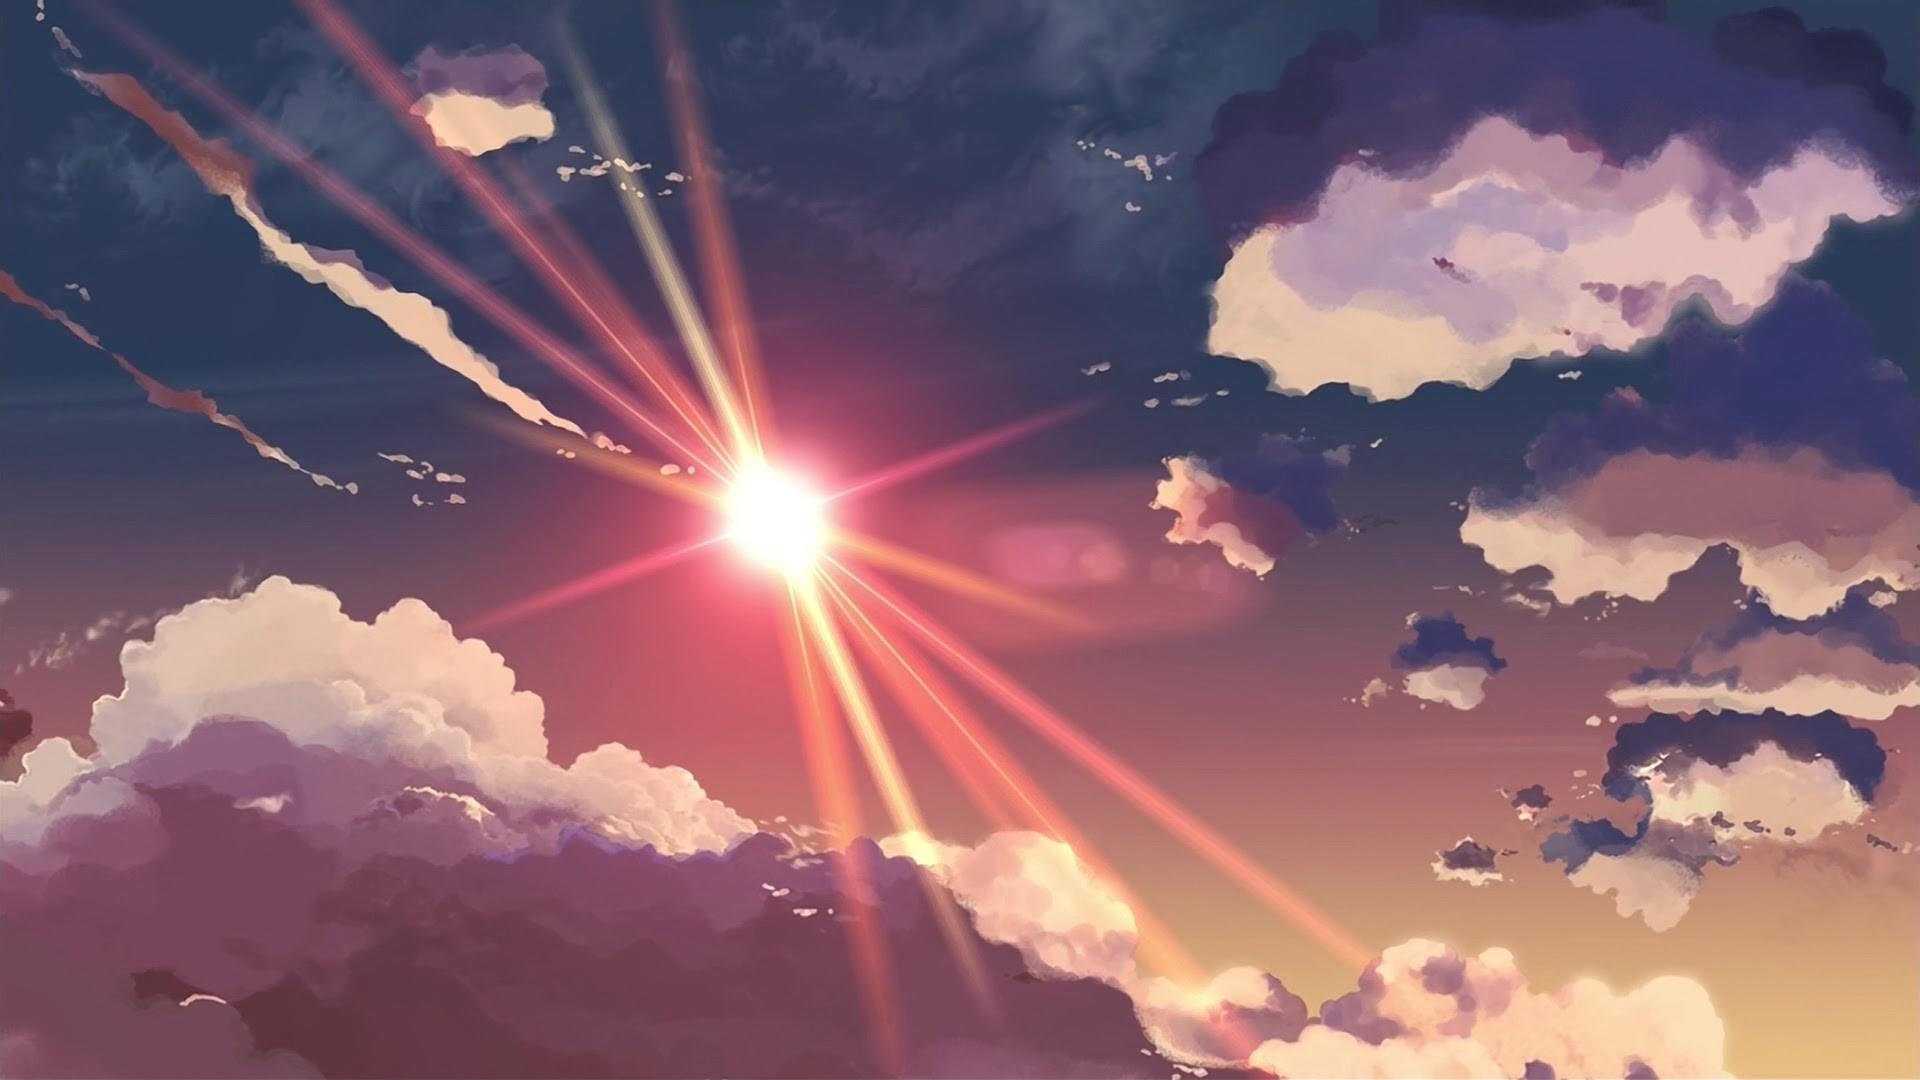 Clouds Sun Sky Rays Makoto Shinkai Artwork